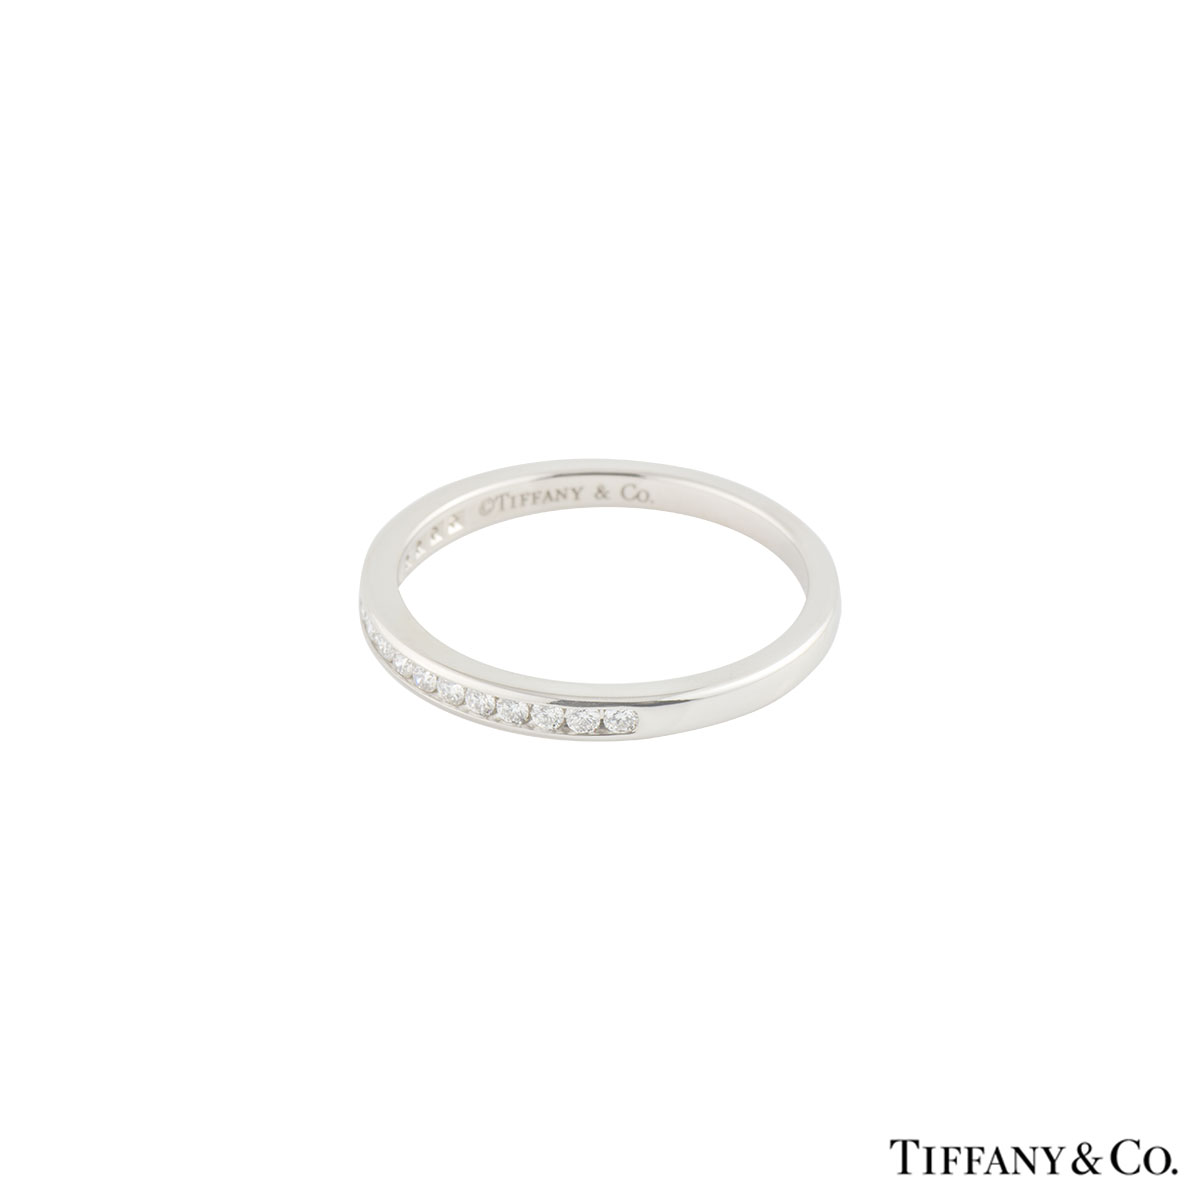 Tiffany & Co. Diamond Platinum Wedding Band